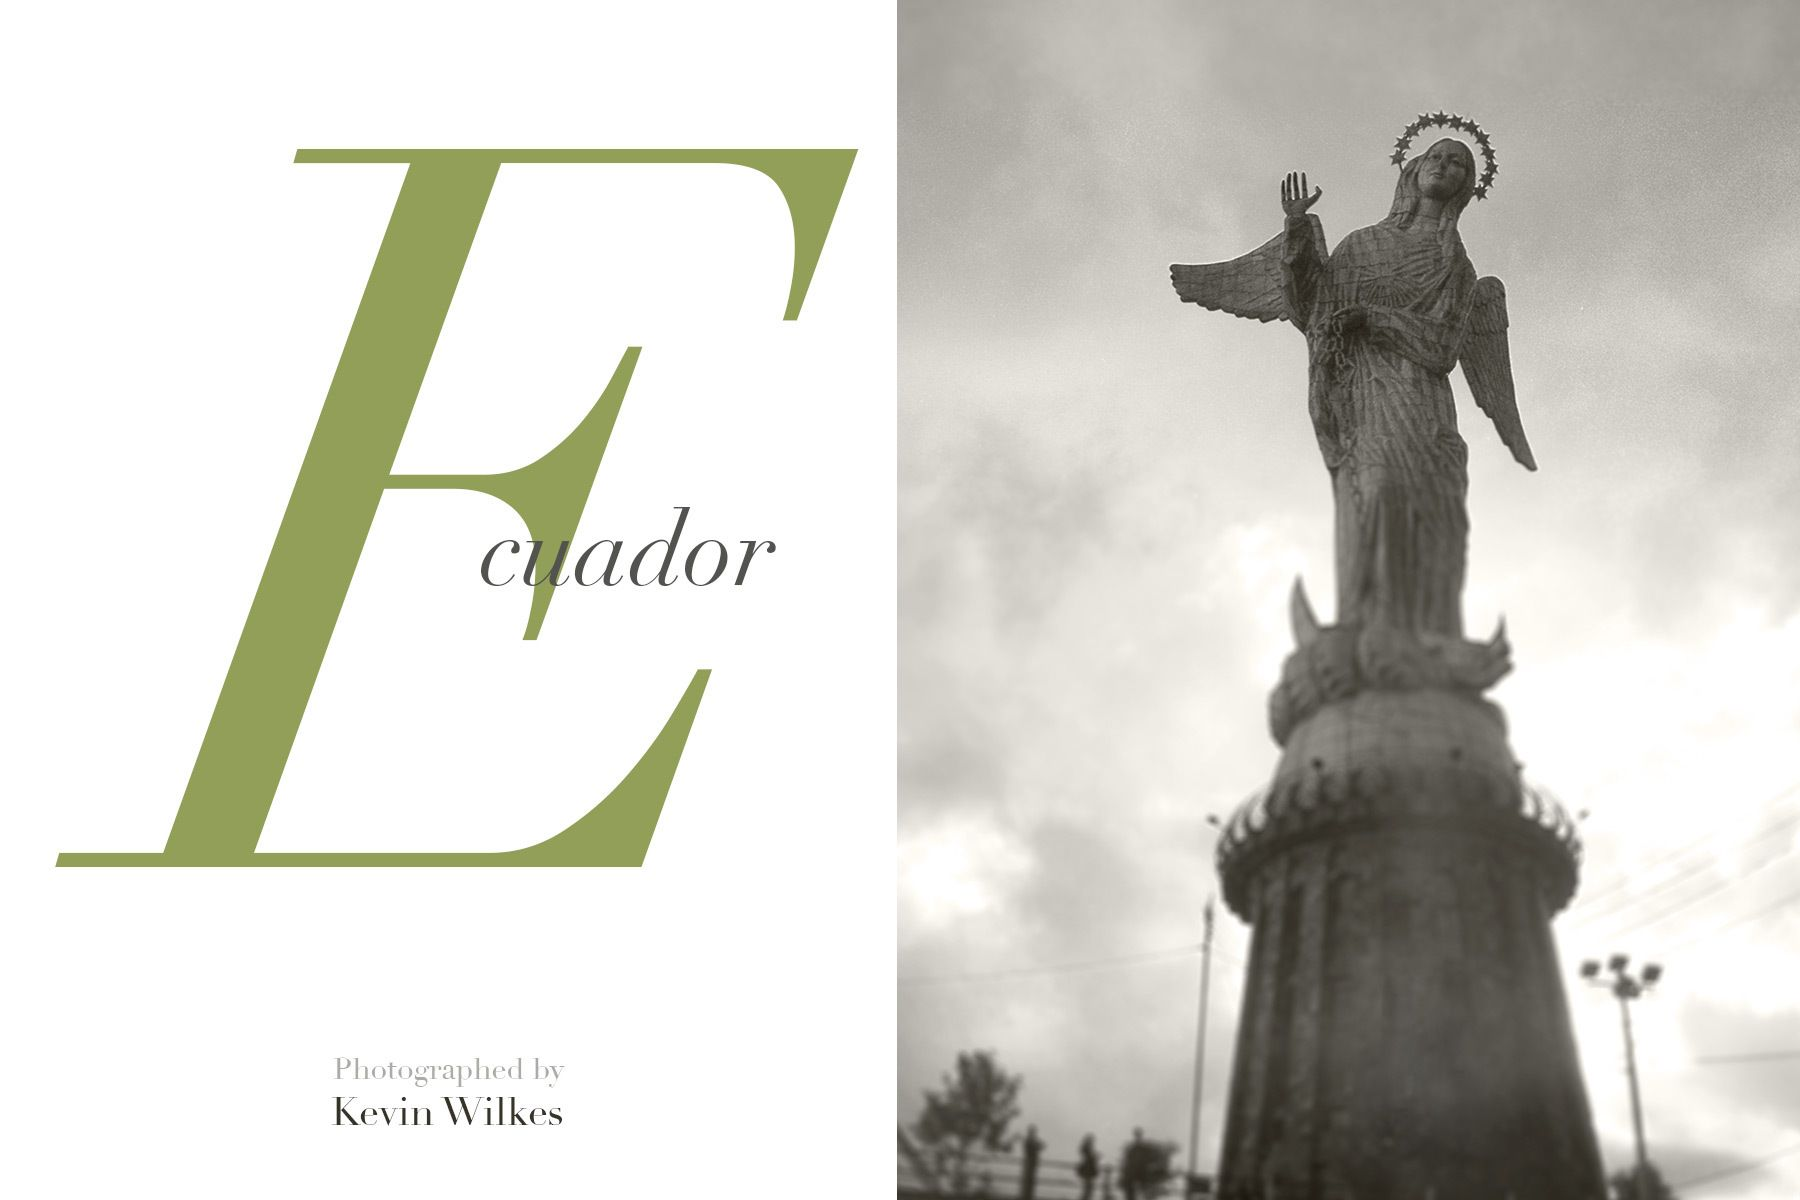 Ecuador. 362 Magazine